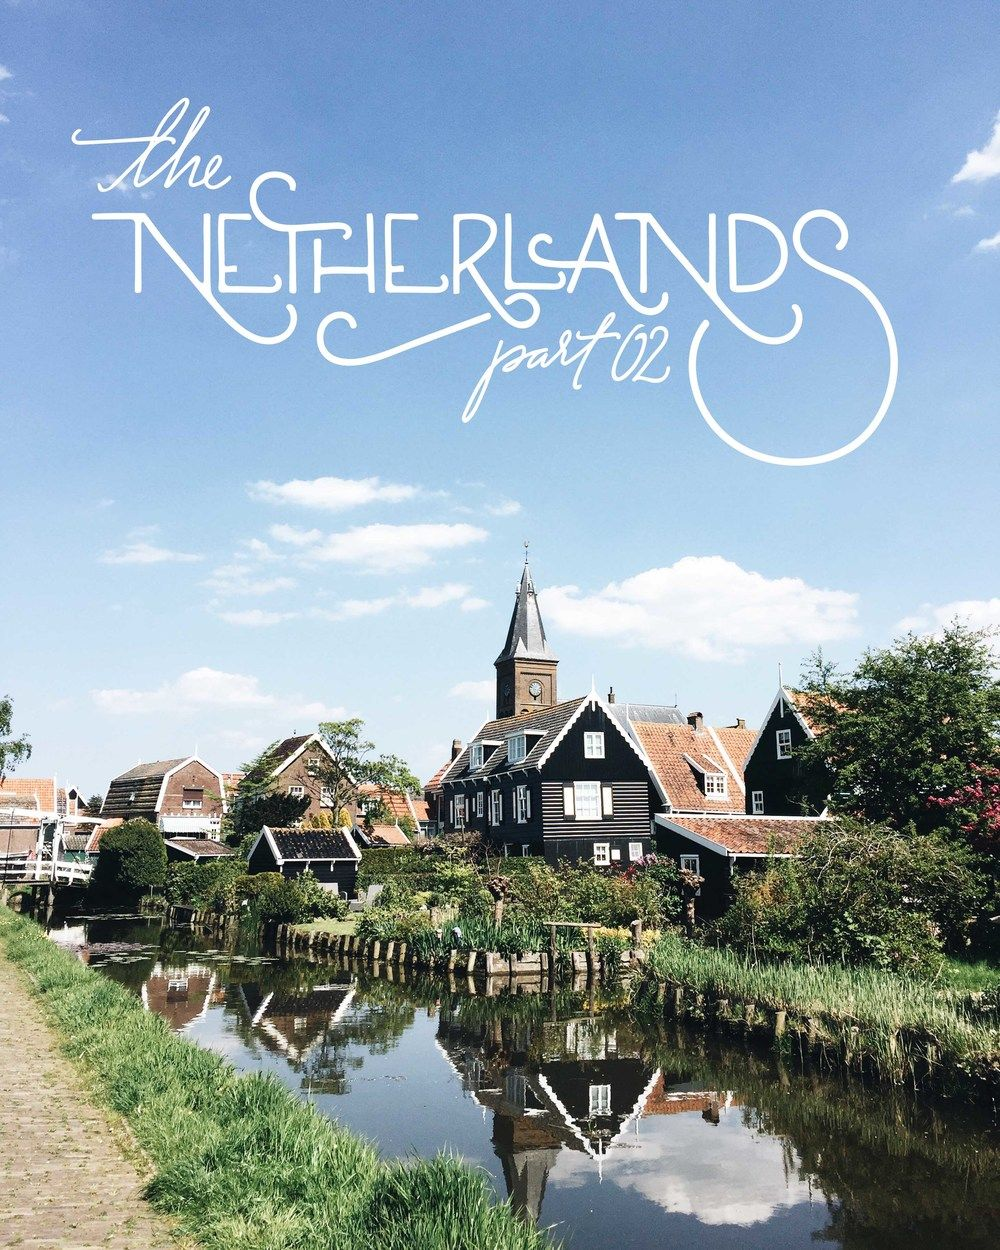 The peninsula of North Holland jutting north